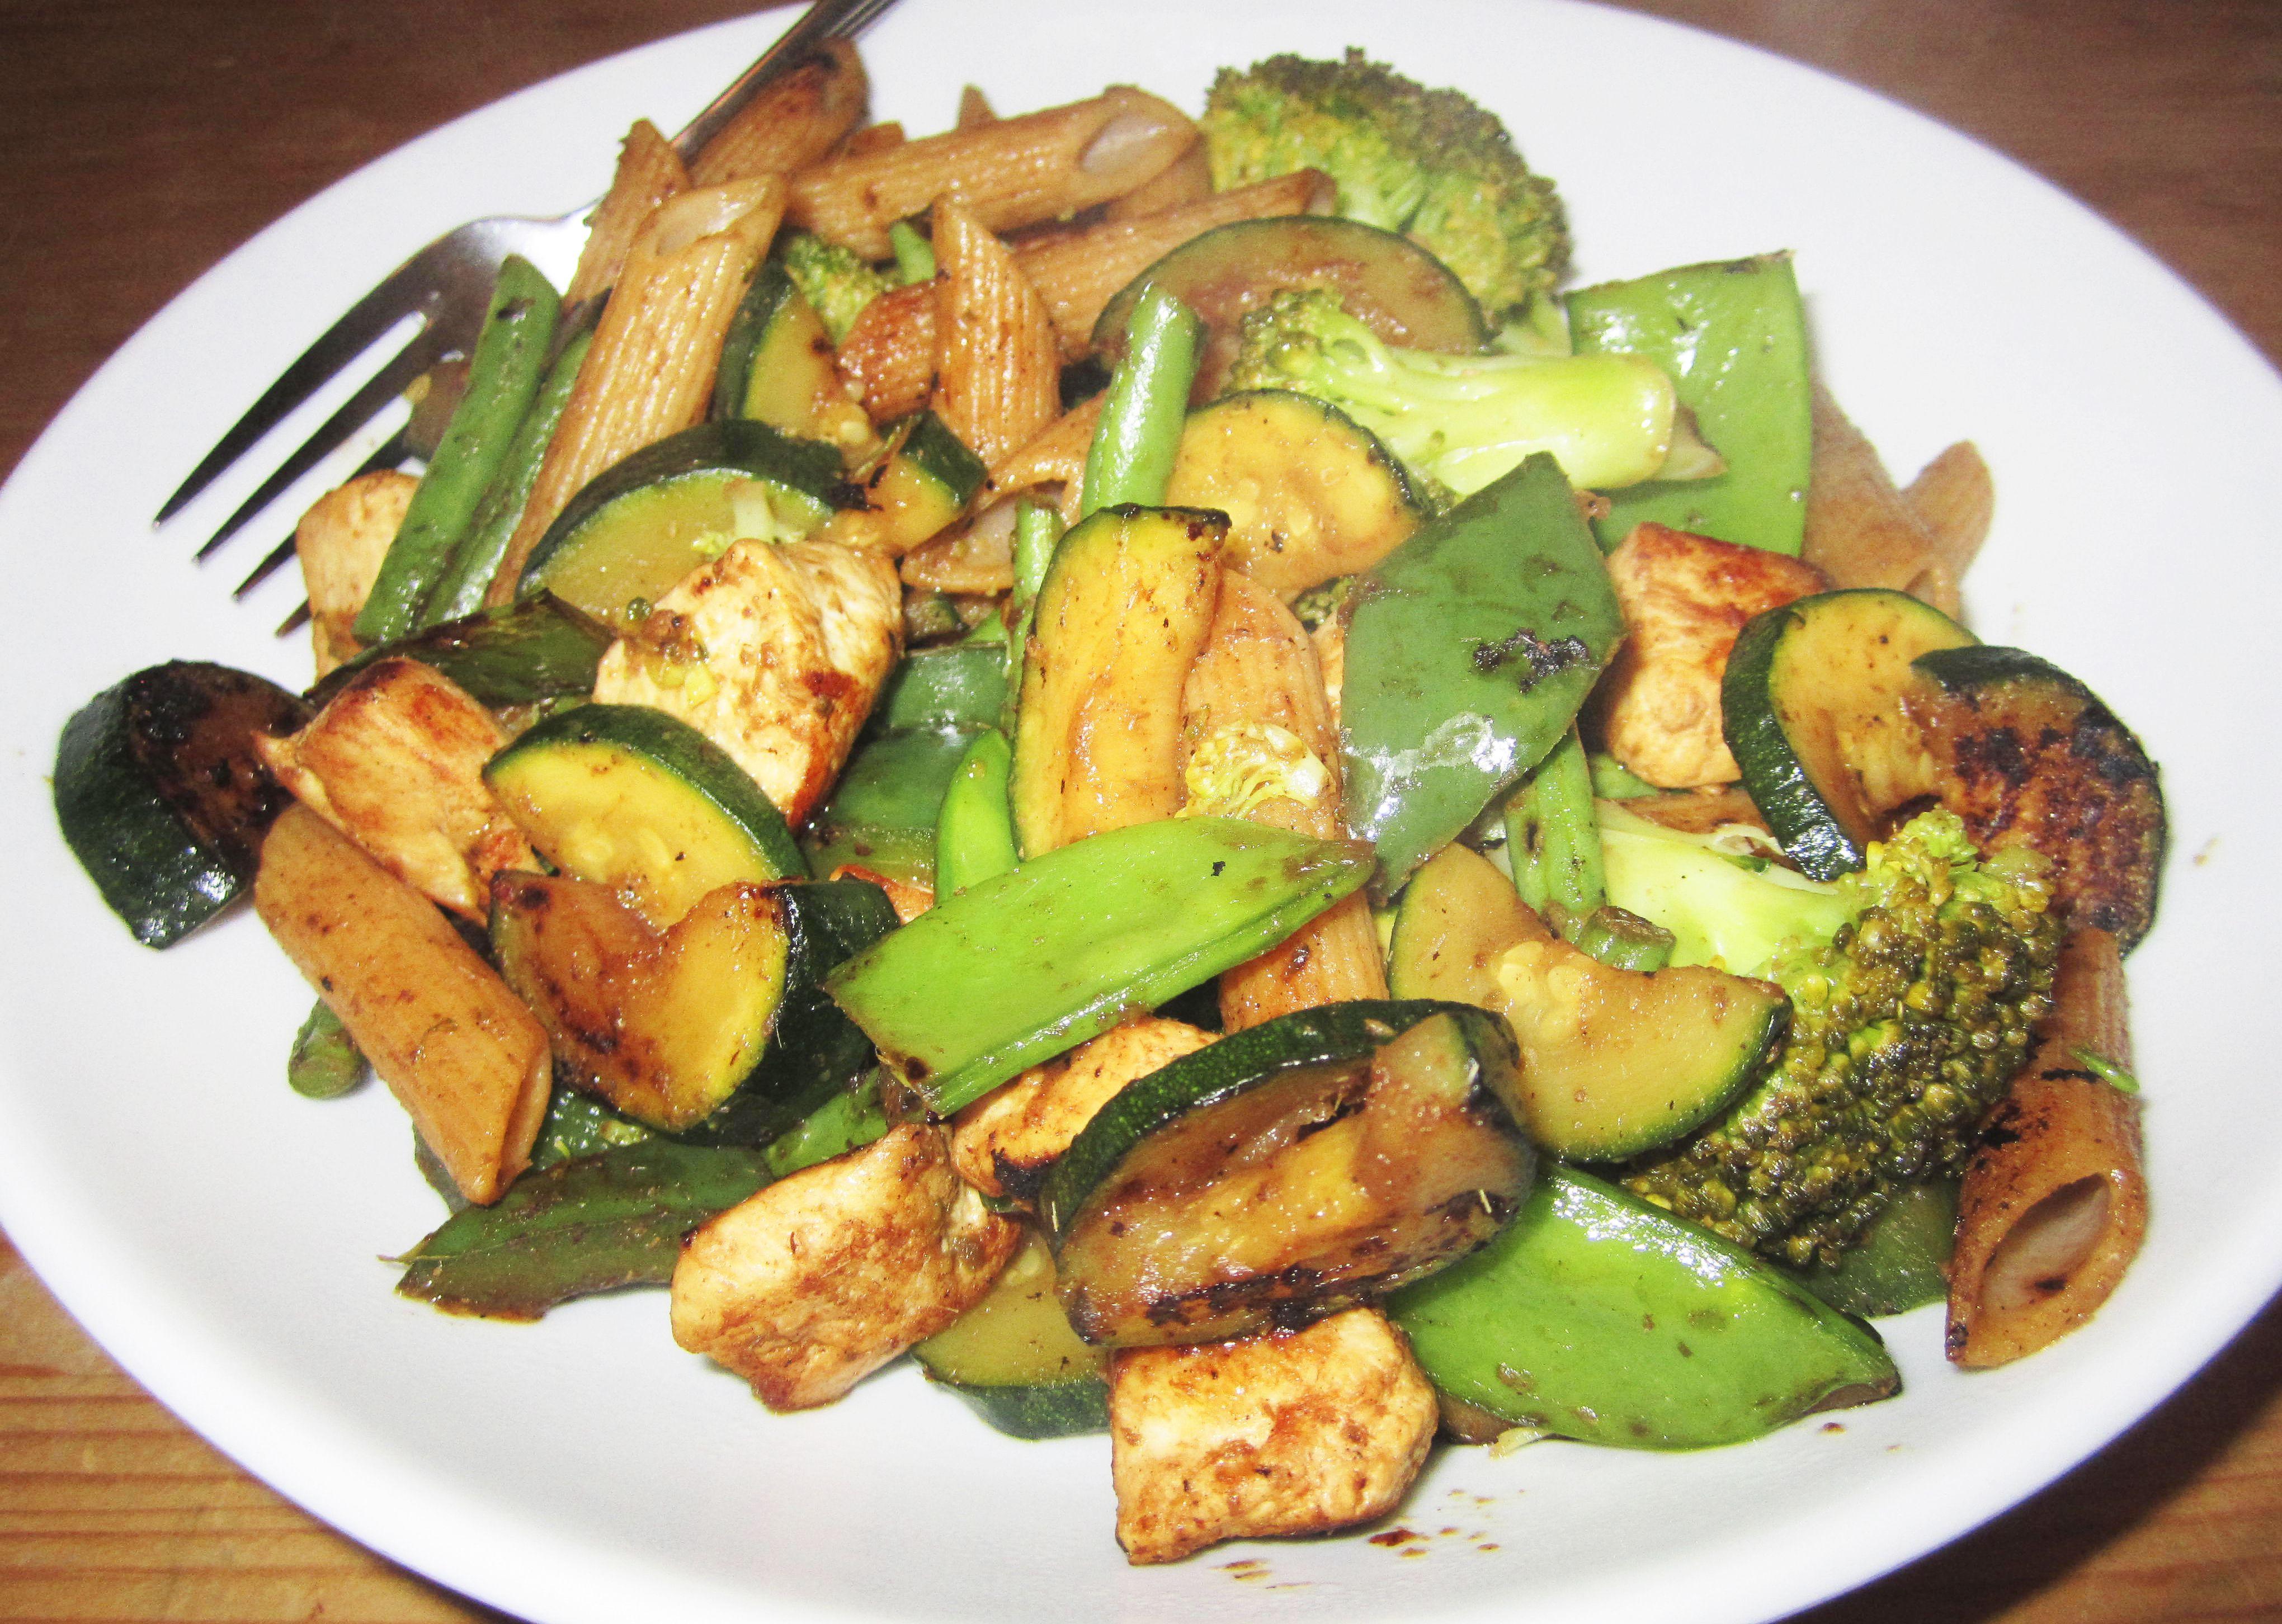 Easy Healthy Chicken Dinner Recipe  Quick chicken dinner recipes healthy Food chicken recipes